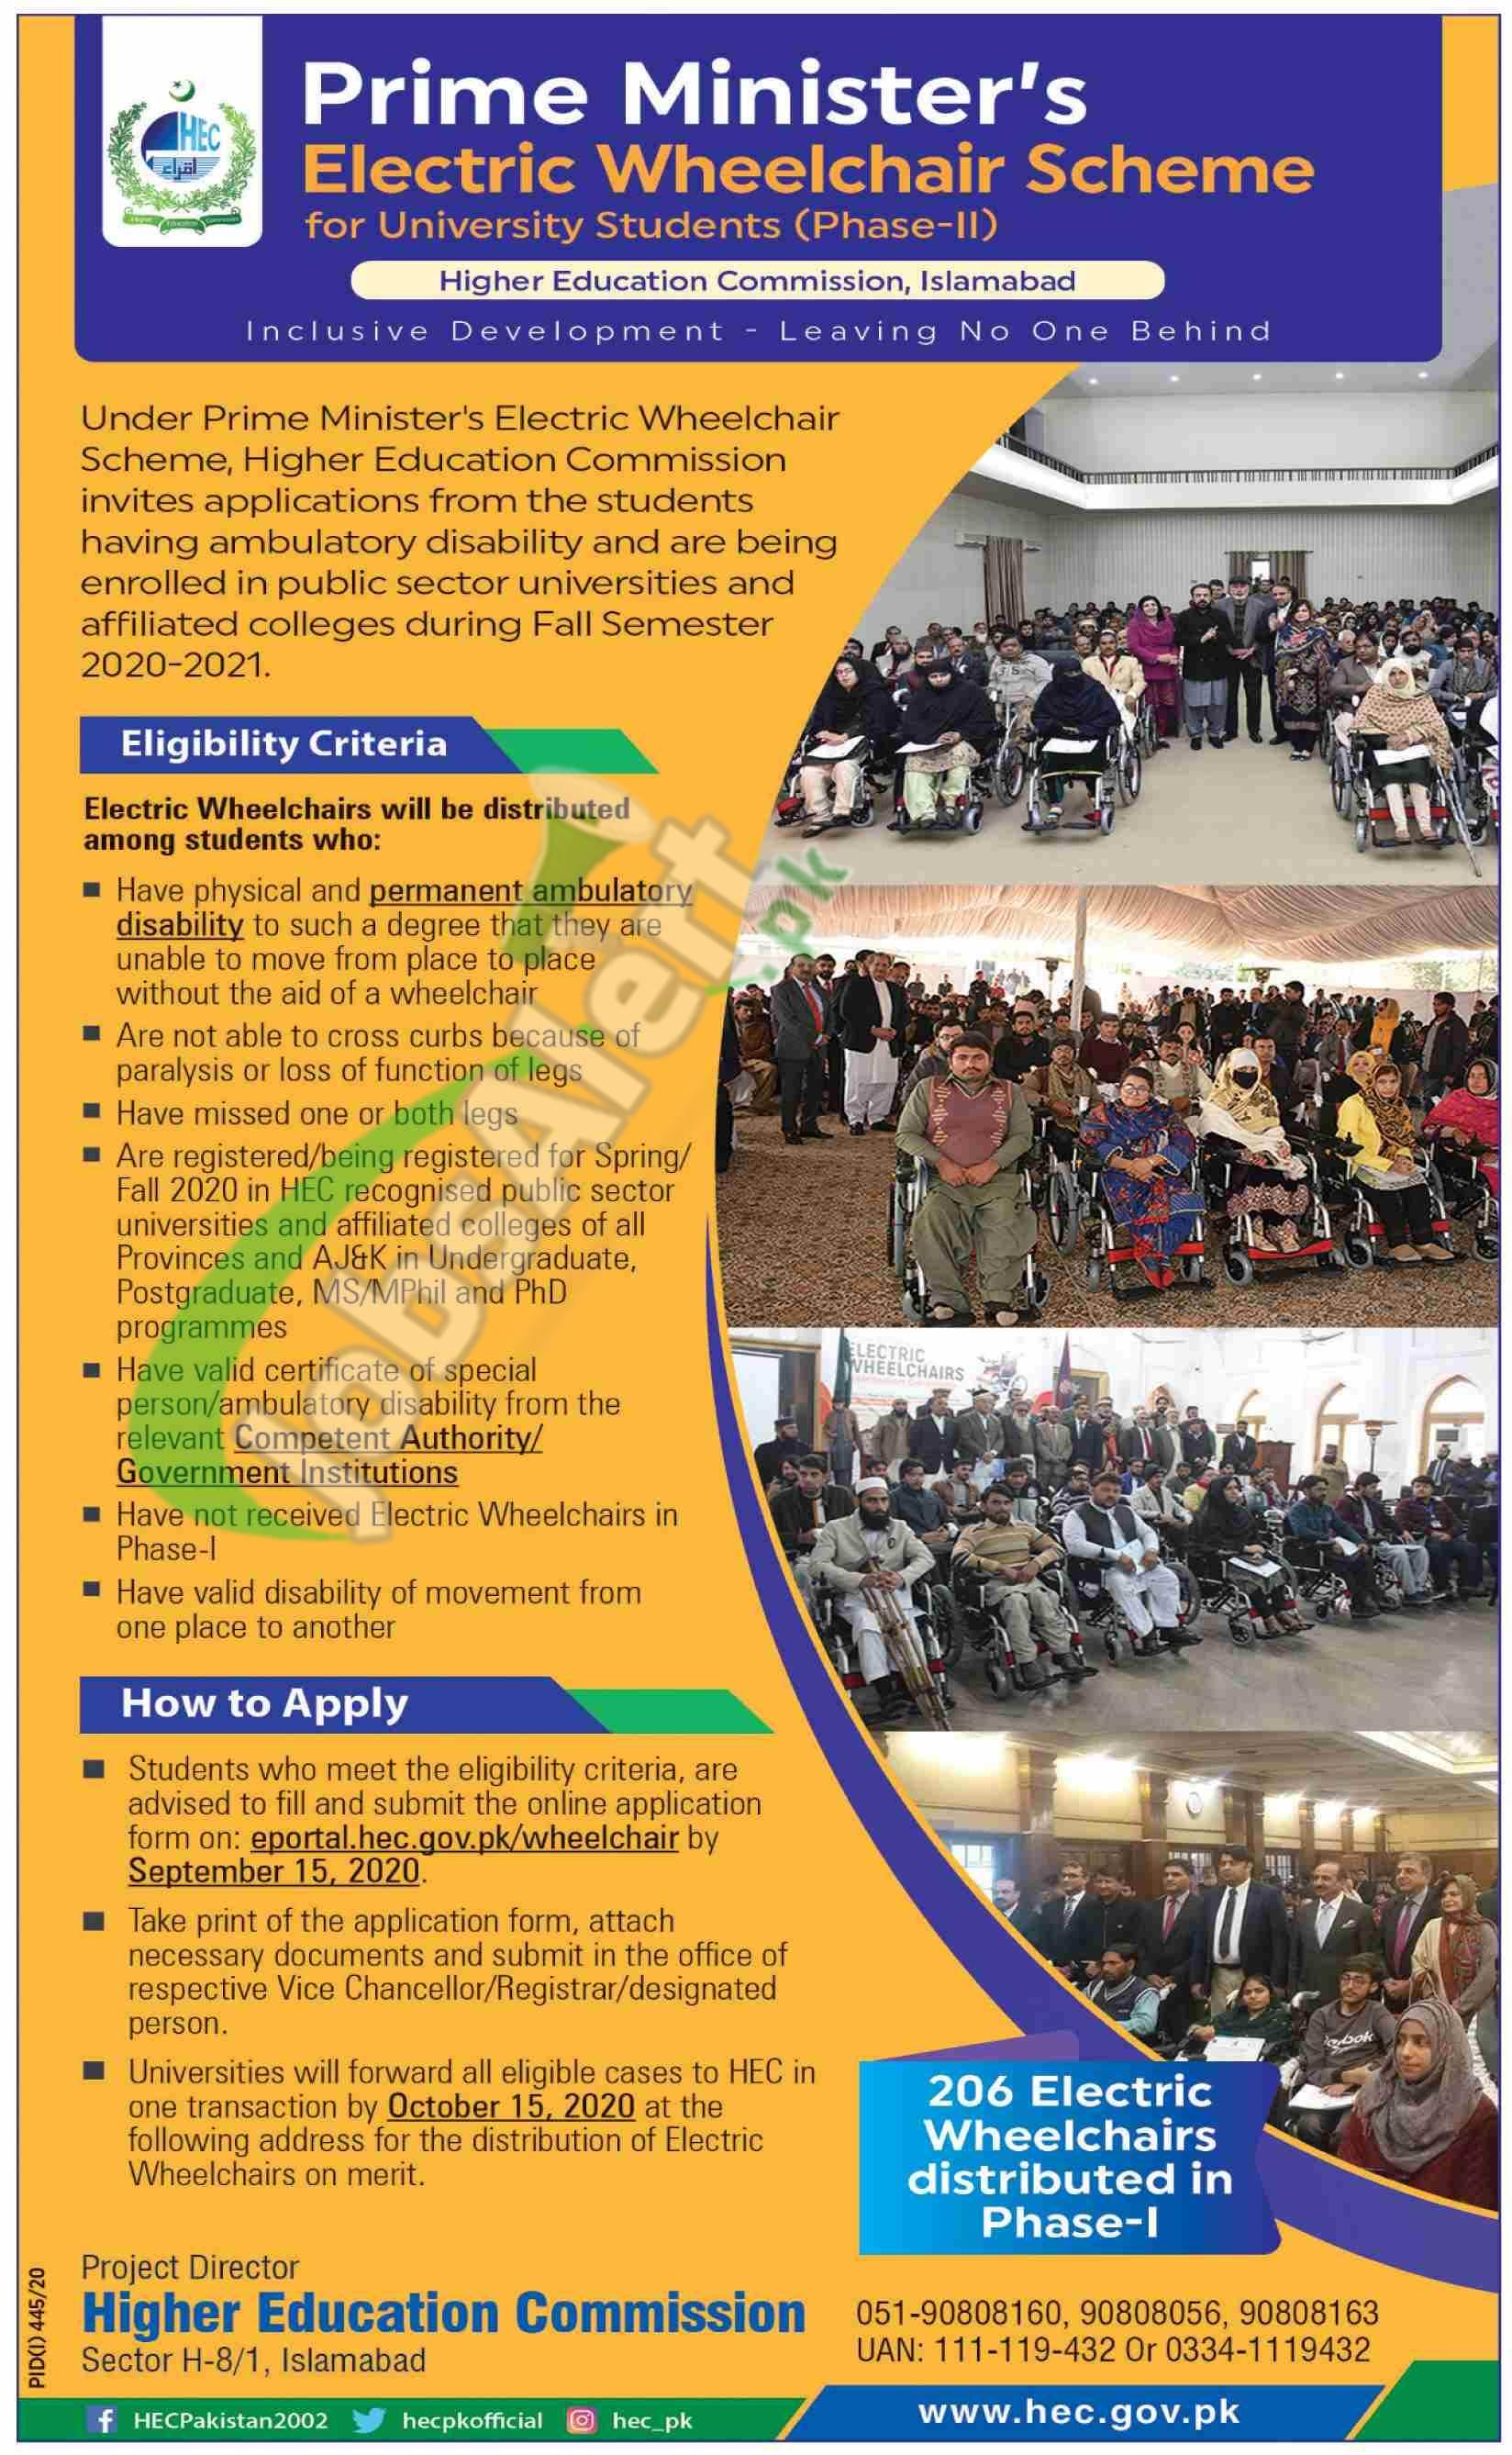 PM Electric Wheelchair Scheme 2020 Apply Online Detailed Eligibility Criteria